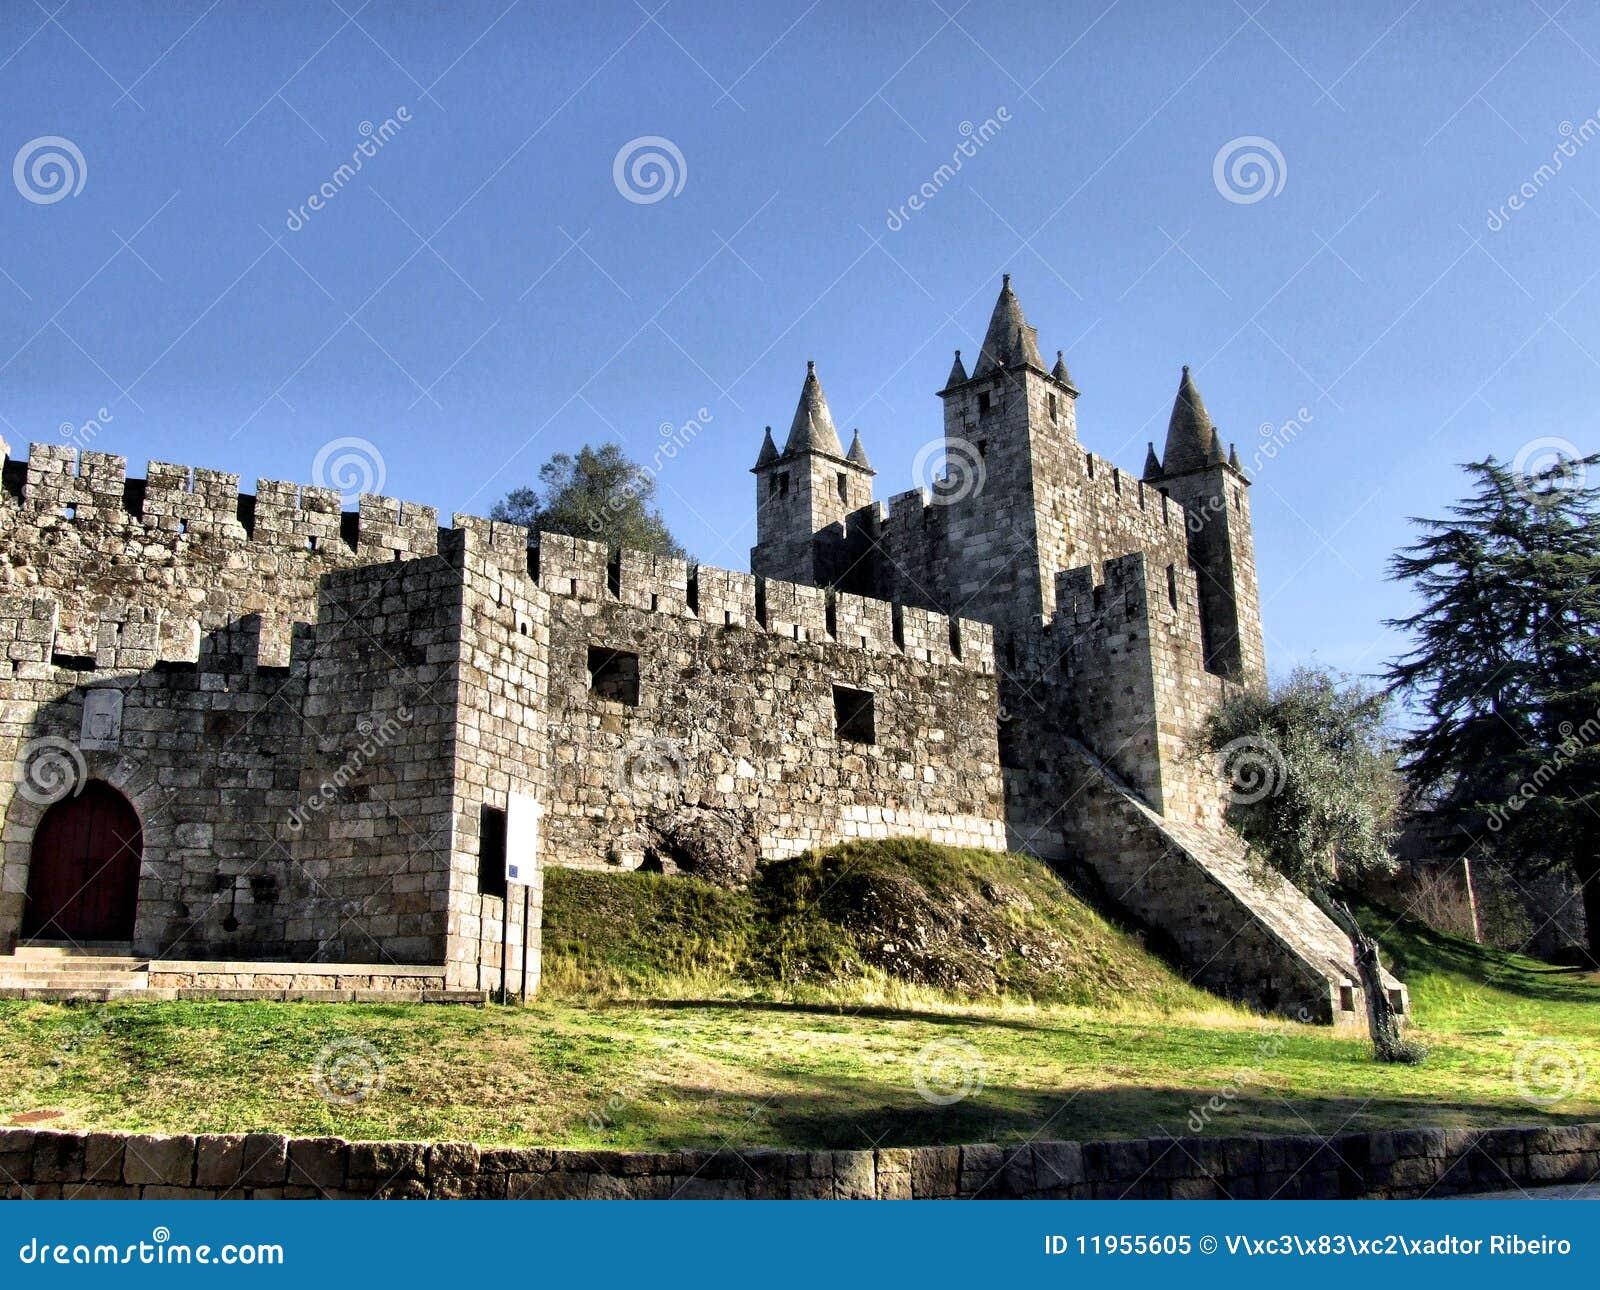 Santa Maria da Feira castle